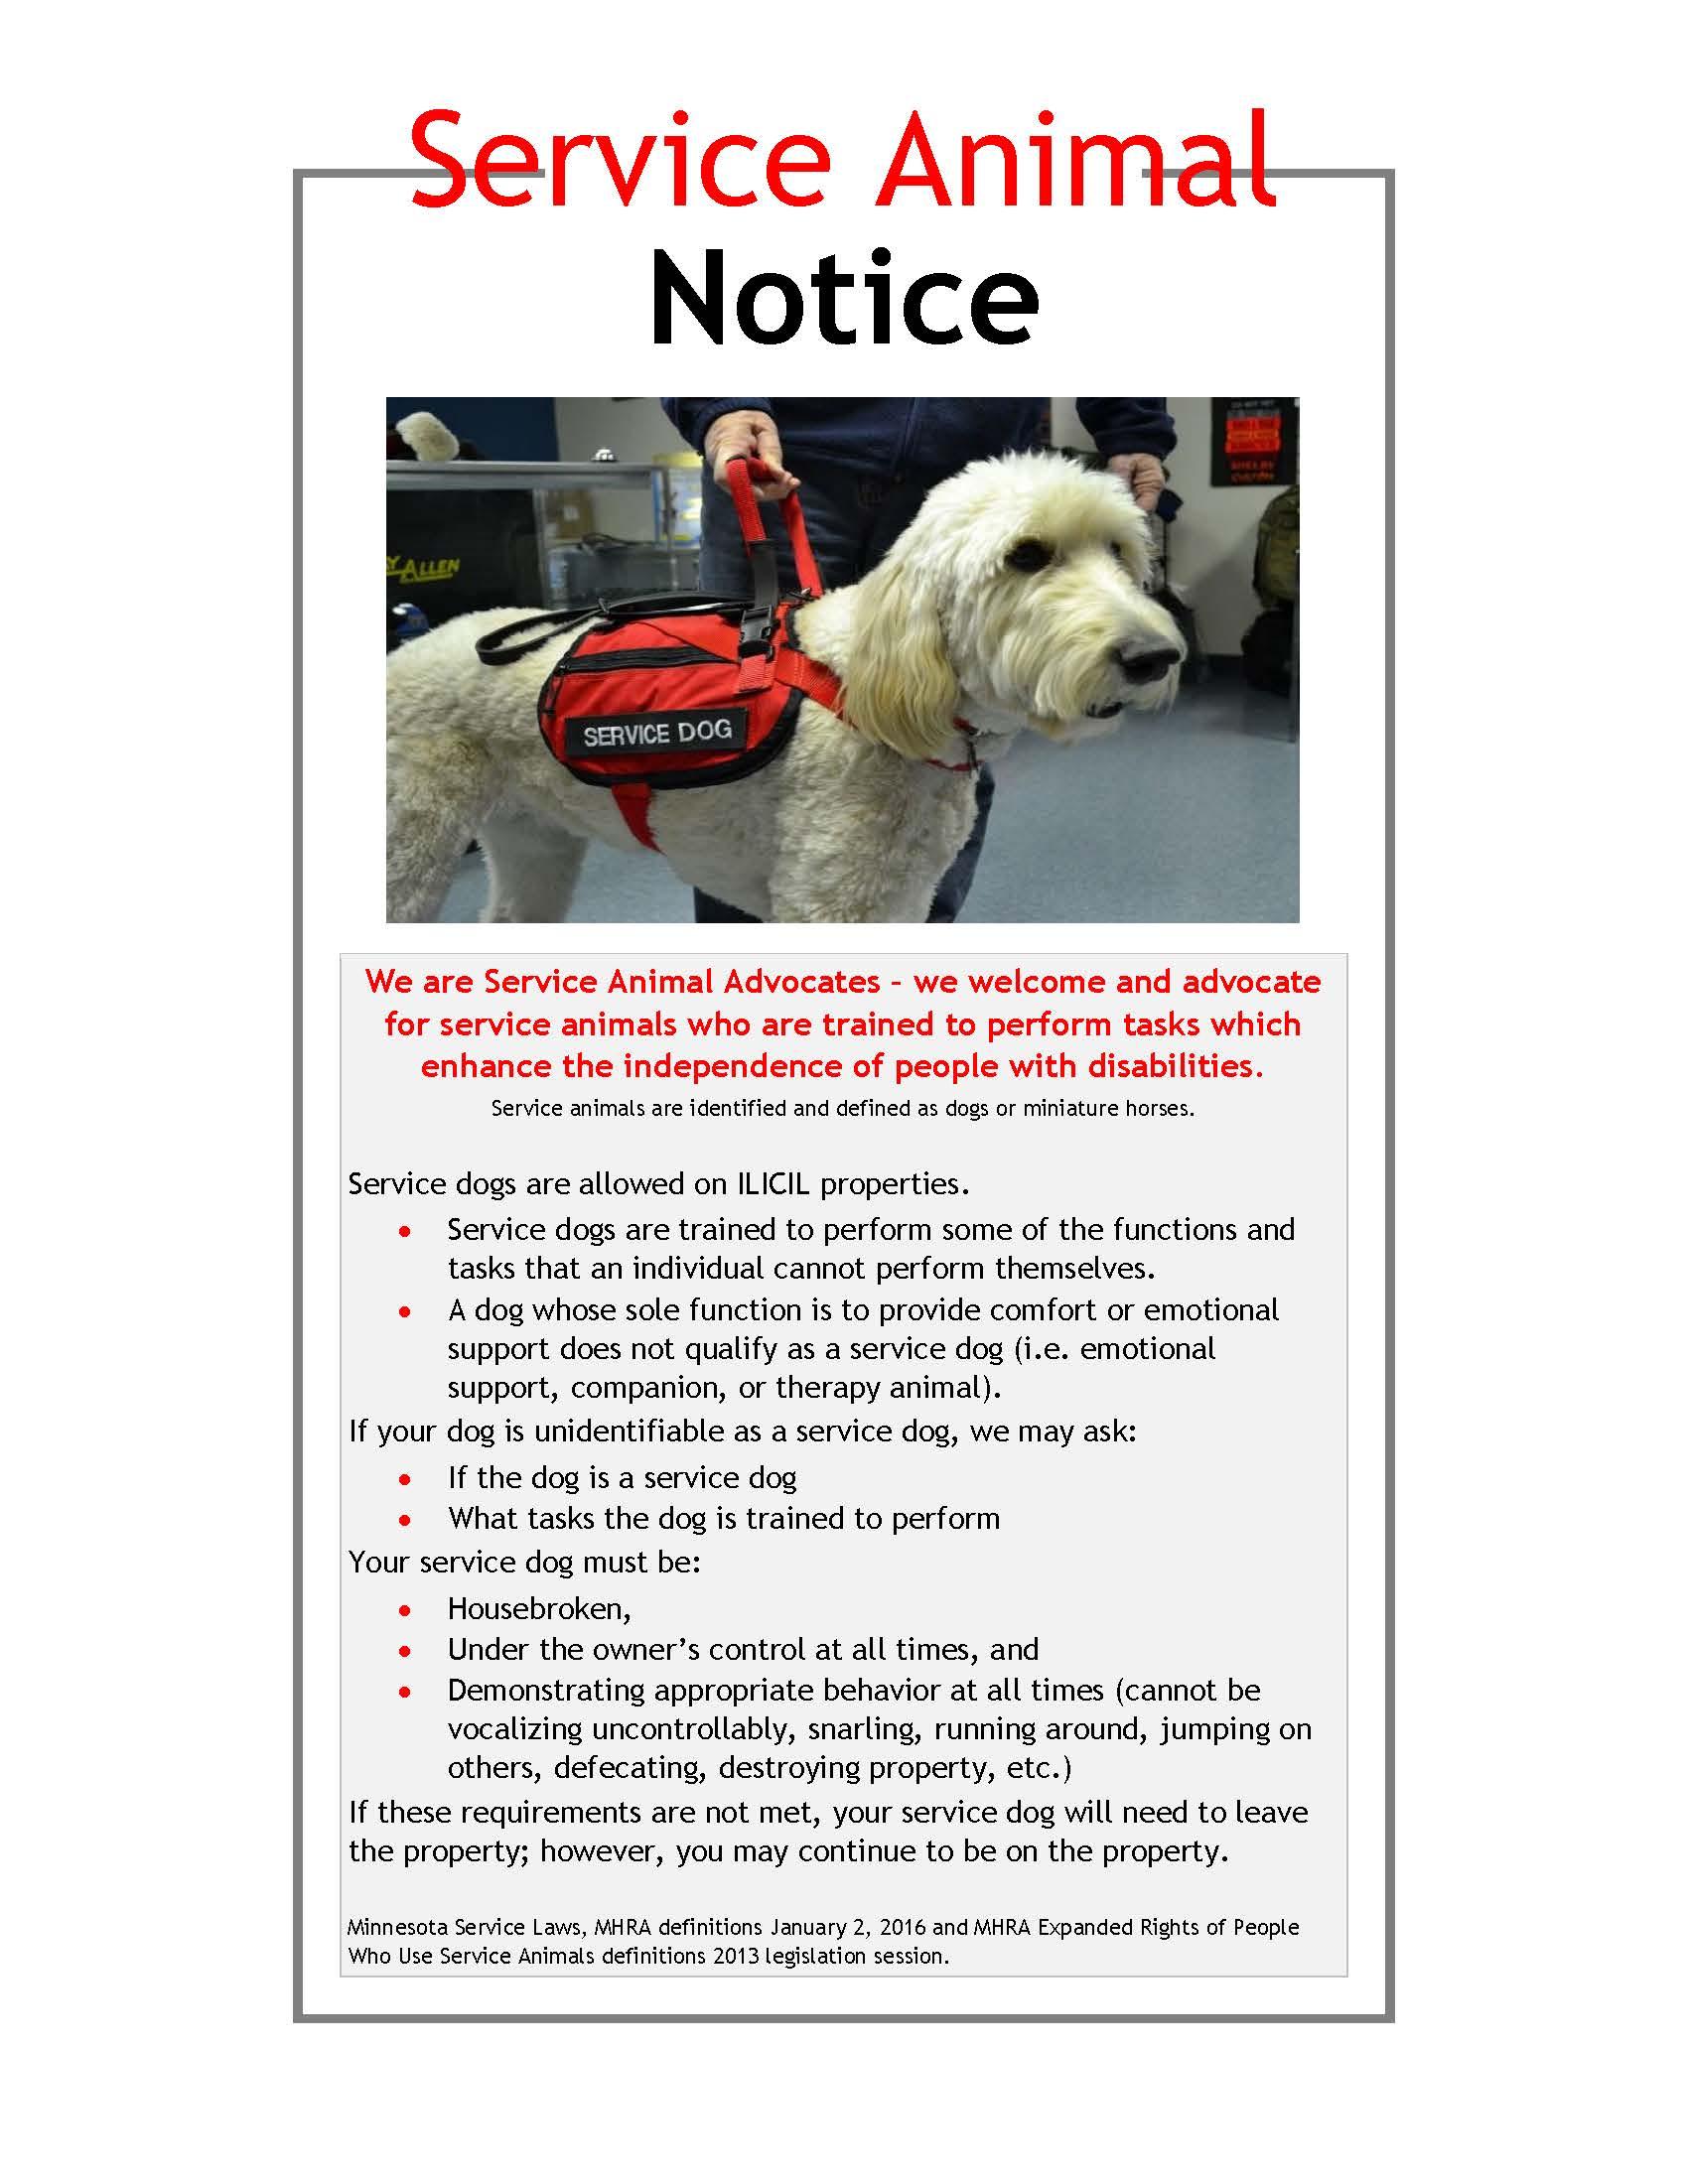 2017 Service animal notice